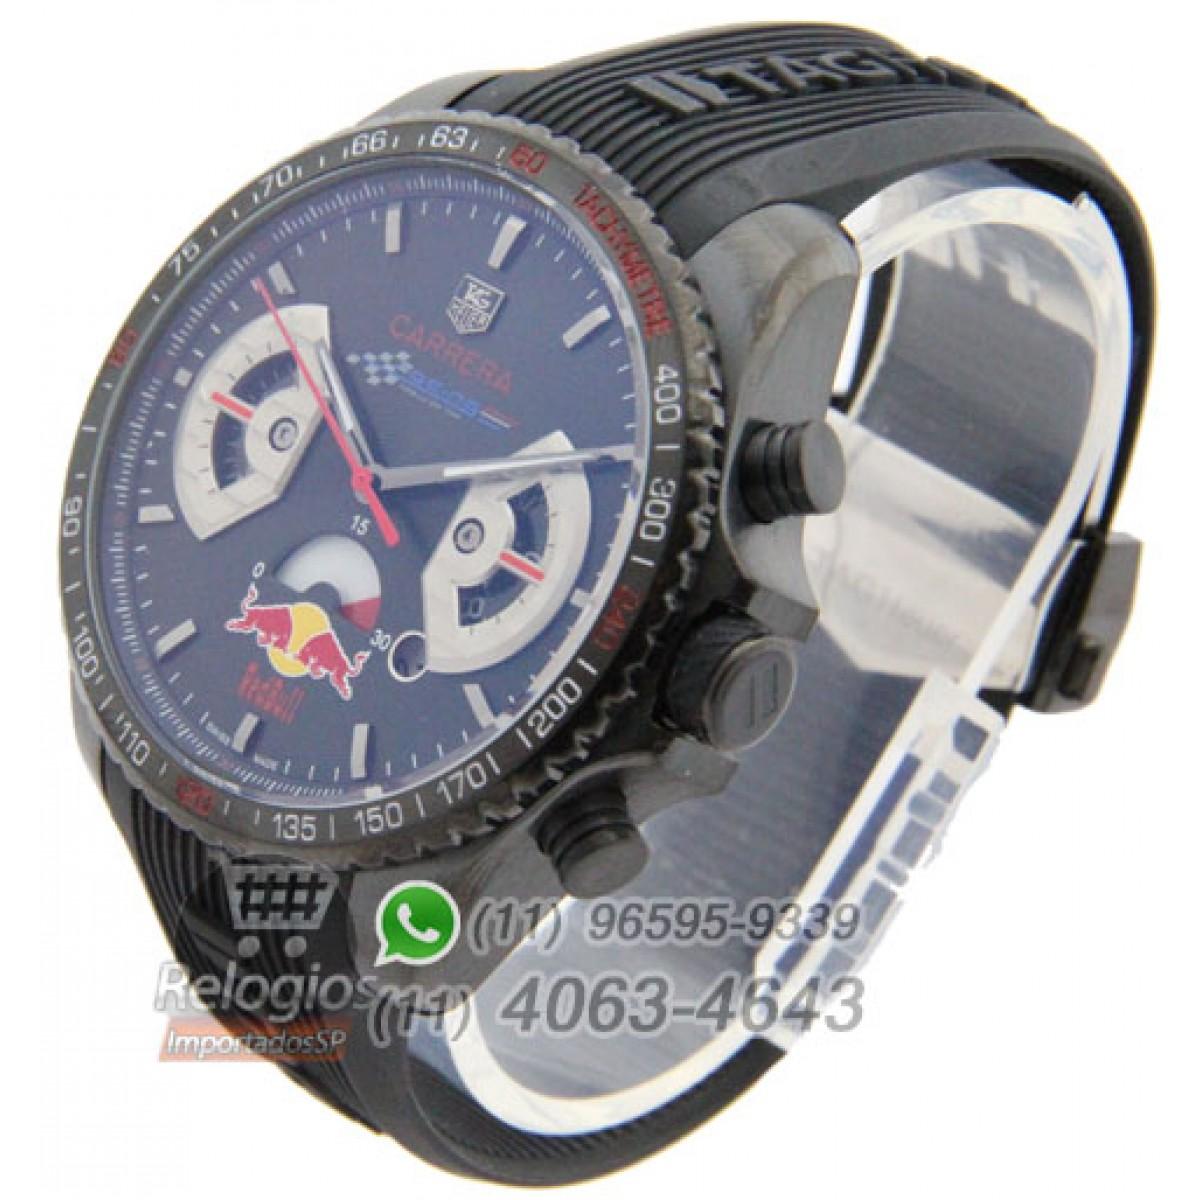 dbc708f20bf Relógio Réplica Tag Heuer Carrera Racing Red Bull Racing